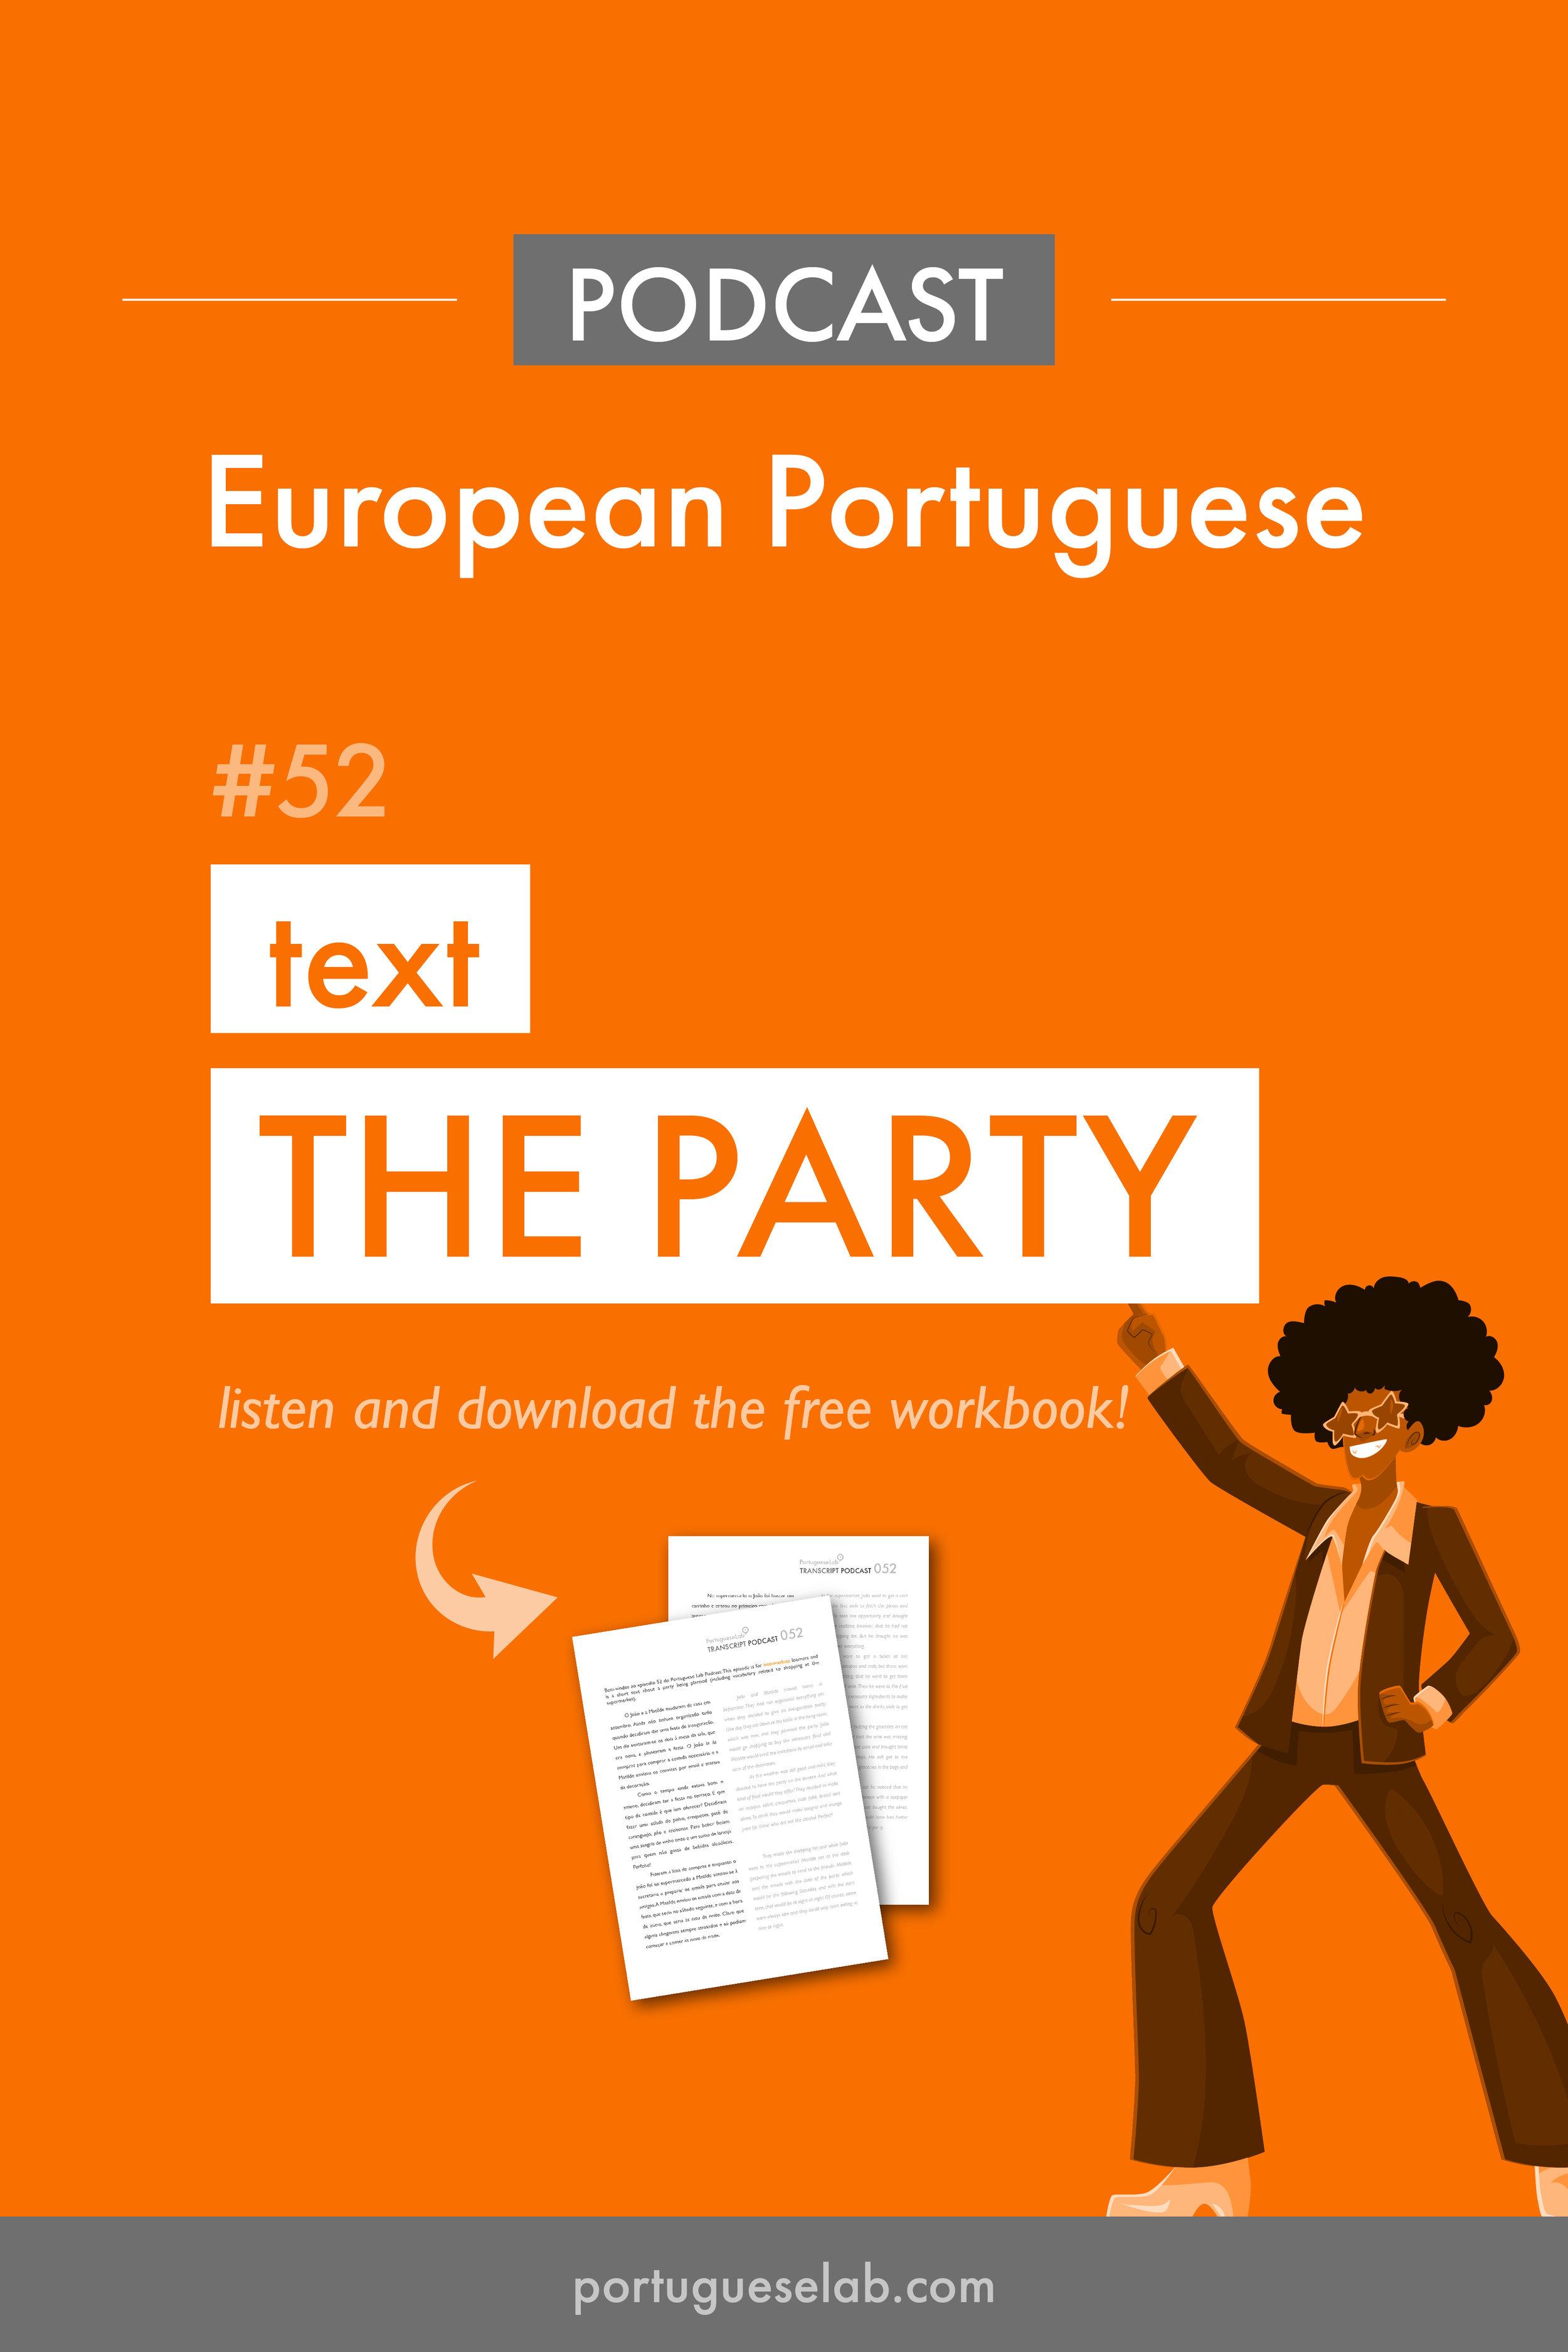 Portuguese Lab Podcast - European Portuguese - 52 - Text - The party.jpg